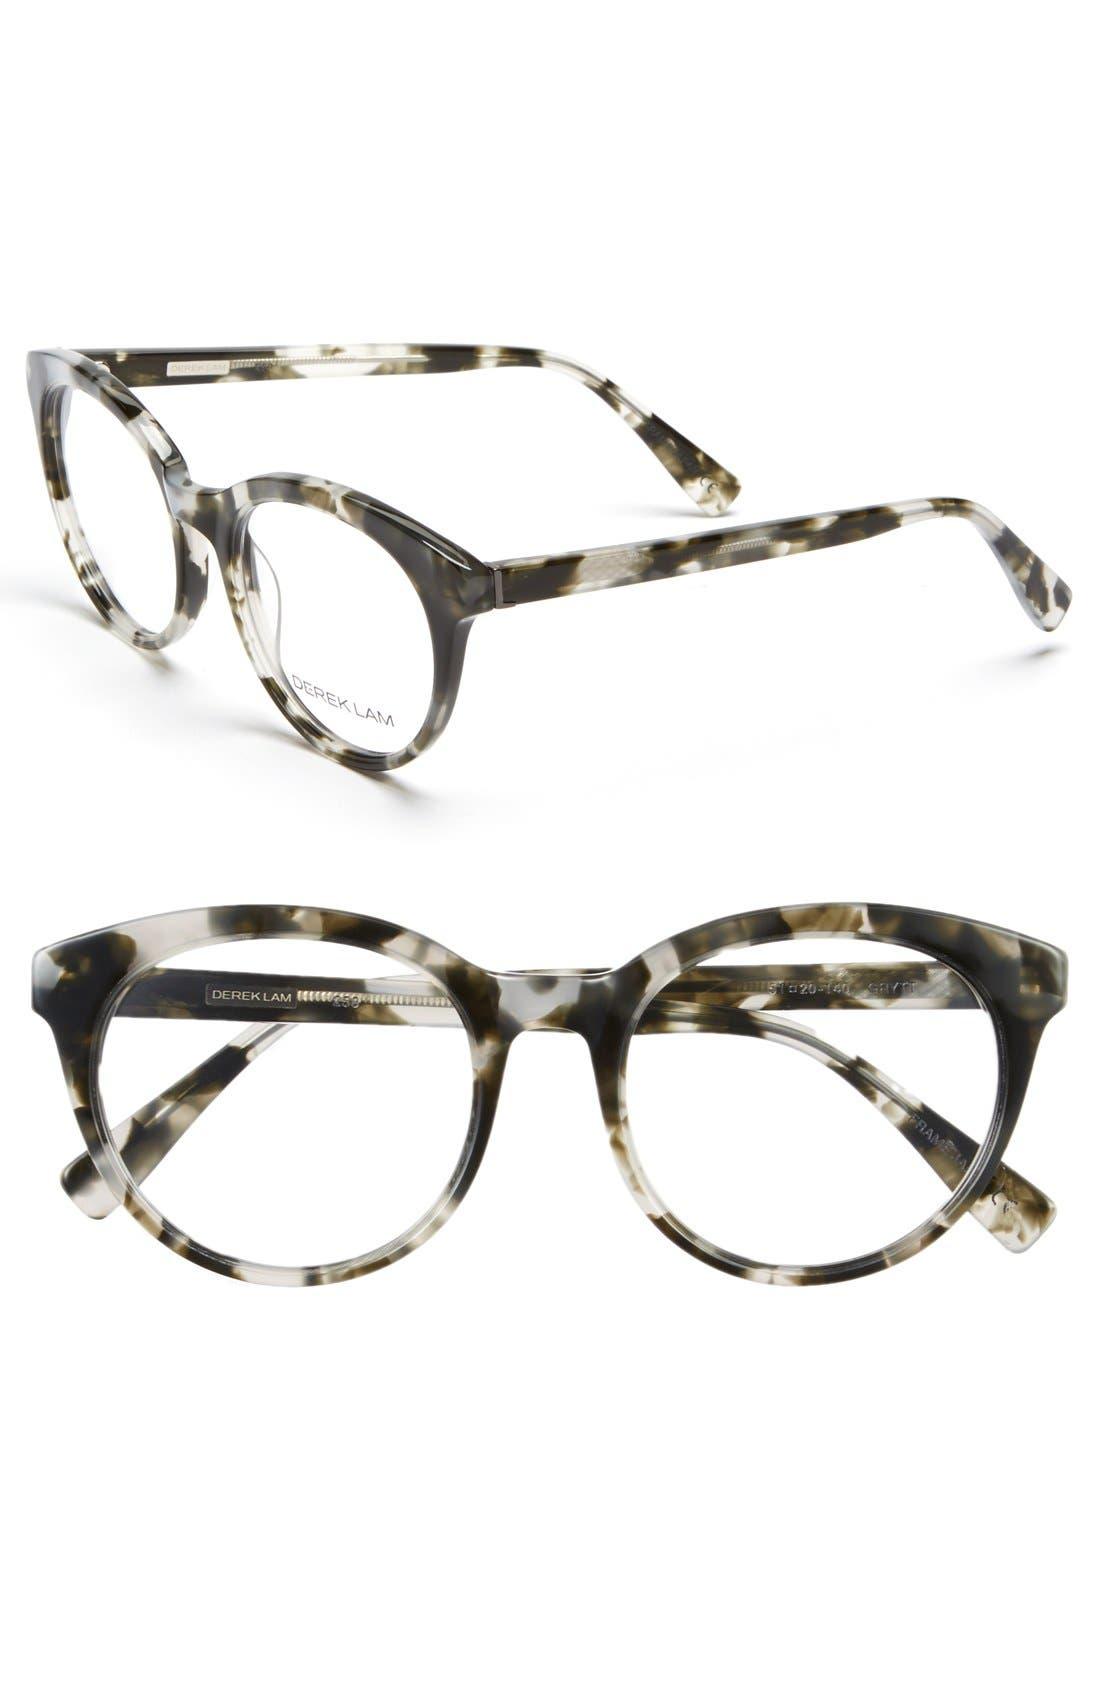 Derek Lam 51mm Optical Glasses